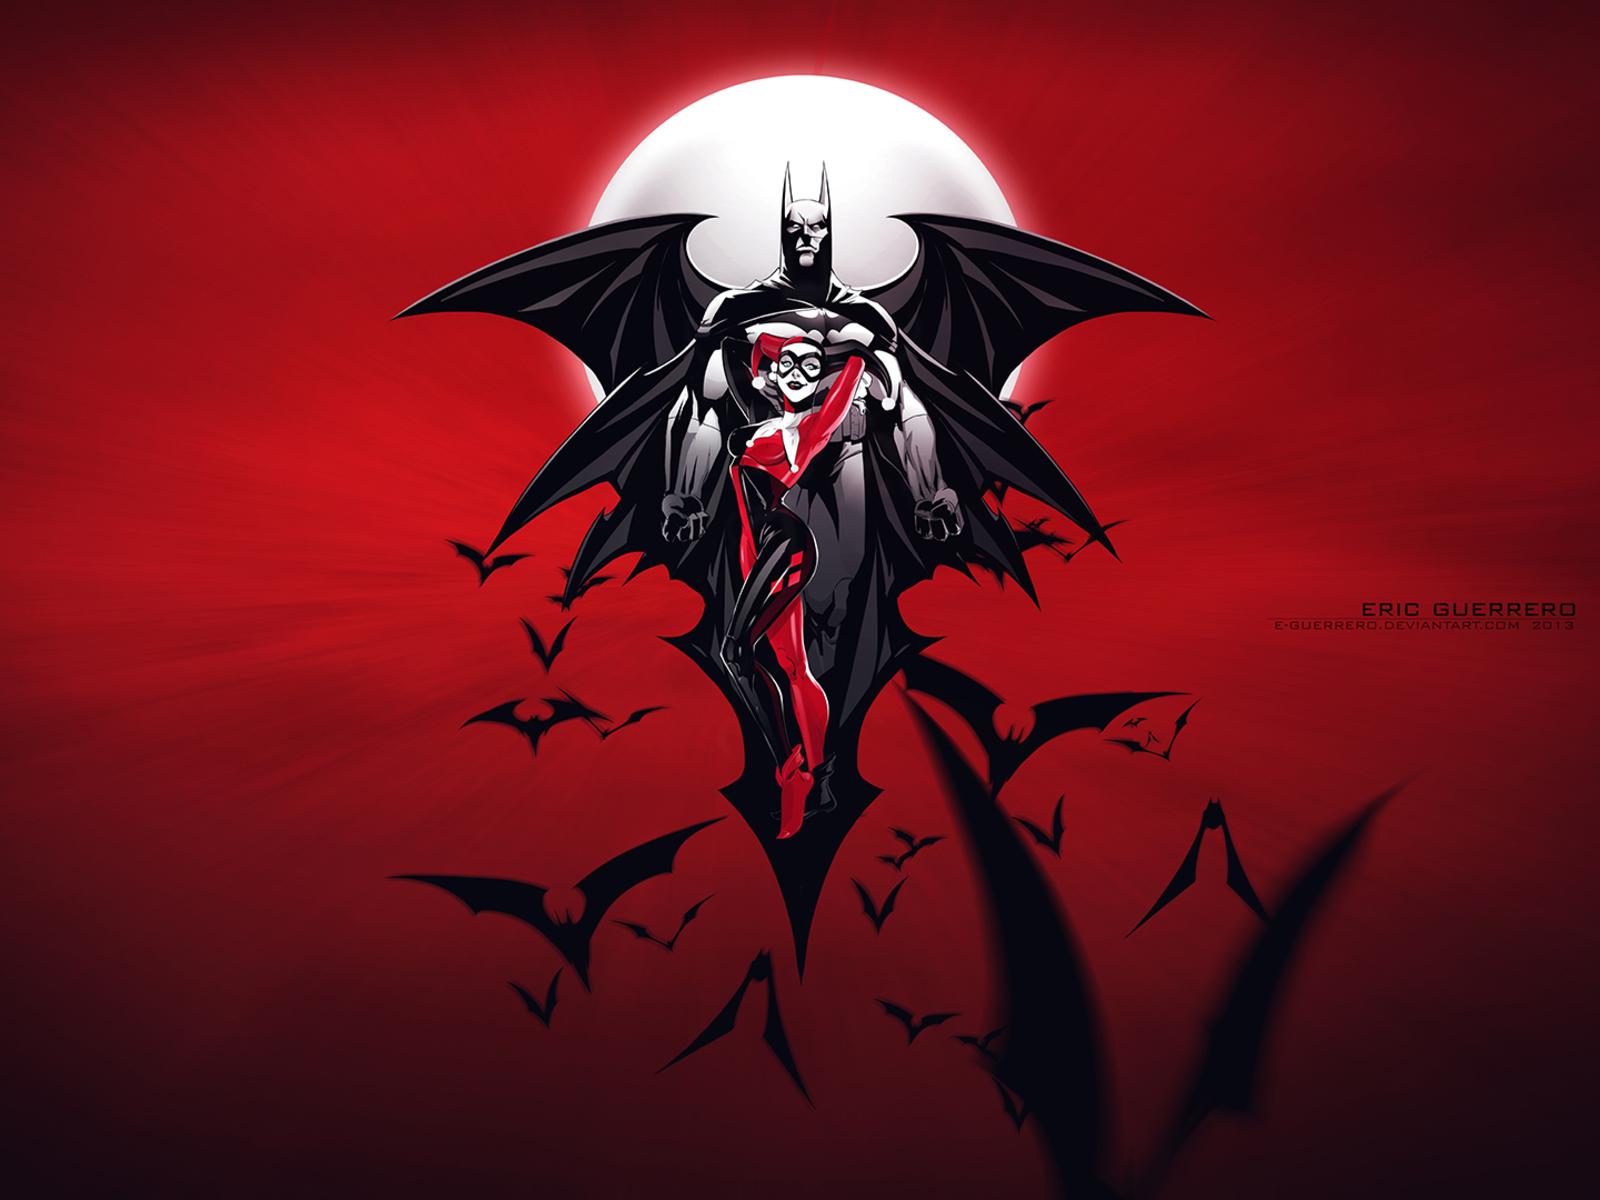 1600x1200 Batman Harley Quinn Art 1600x1200 Resolution Hd 4k